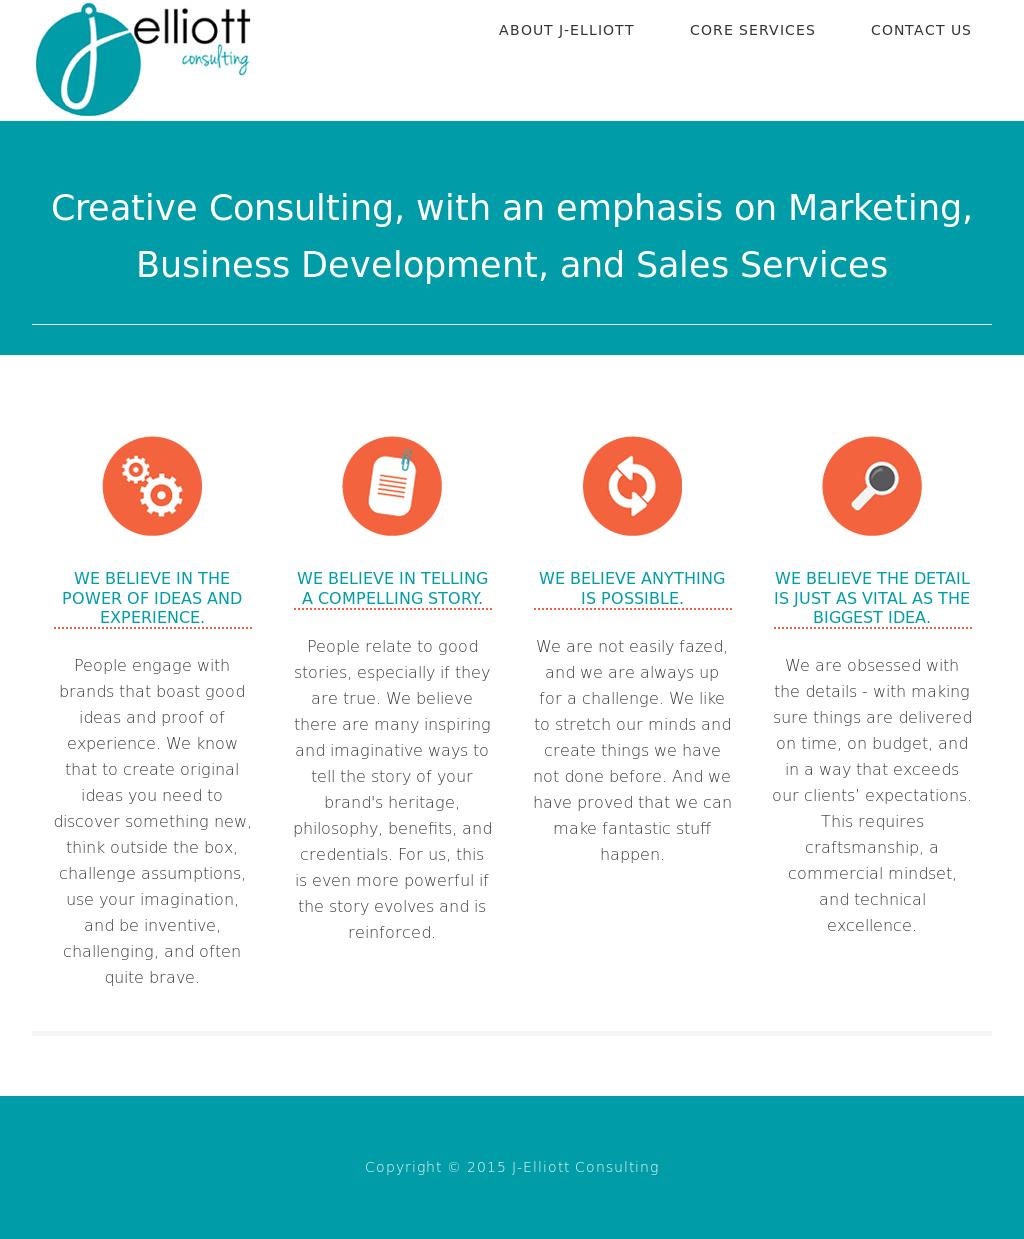 J-elliott Consulting Competitors, Revenue and Employees